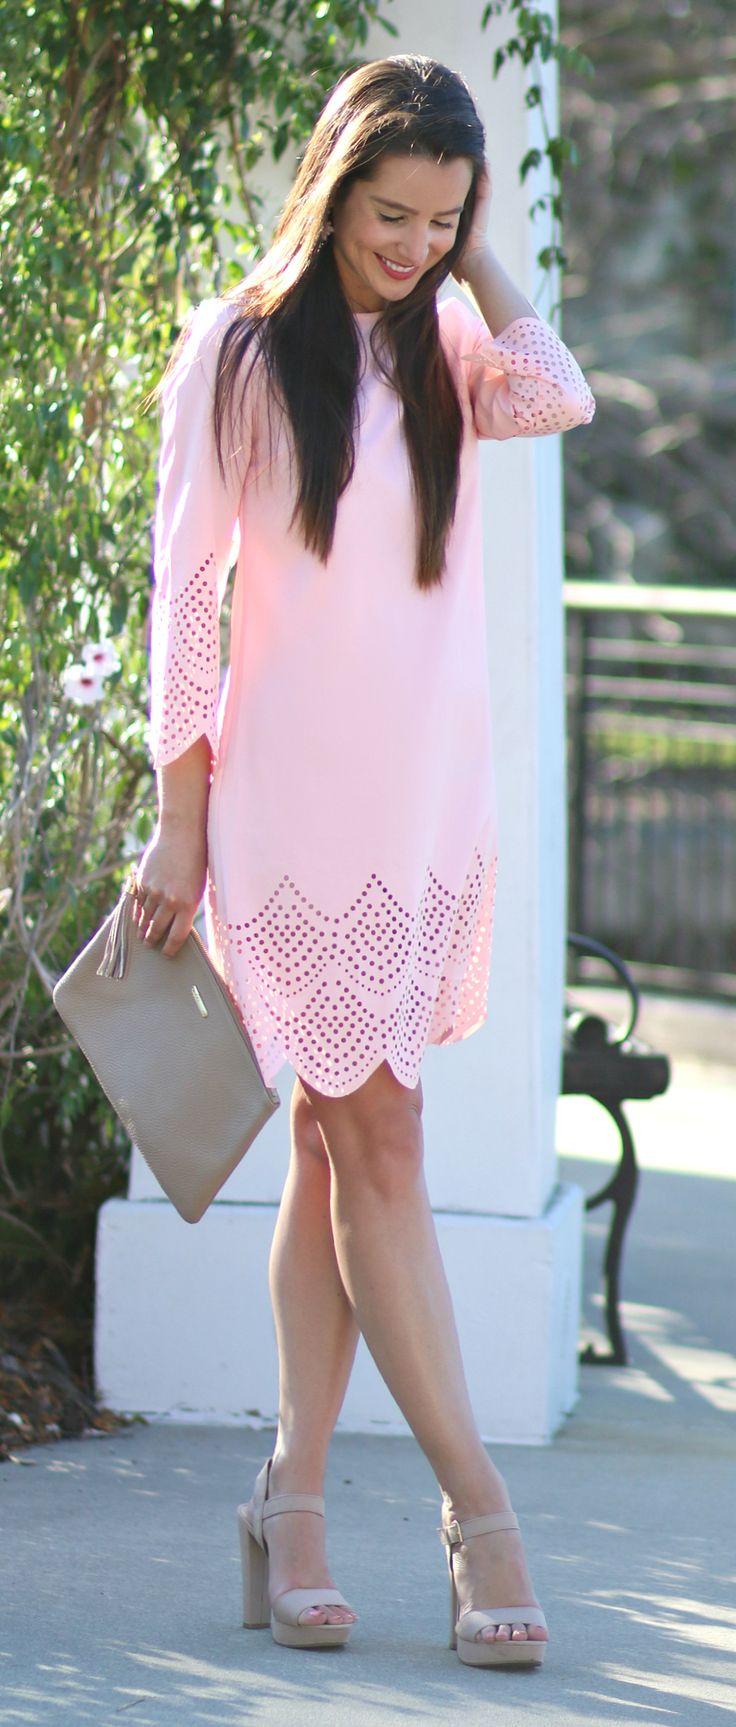 Best 25 wedding guest dresses ideas on pinterest for Dresses for spring wedding guest